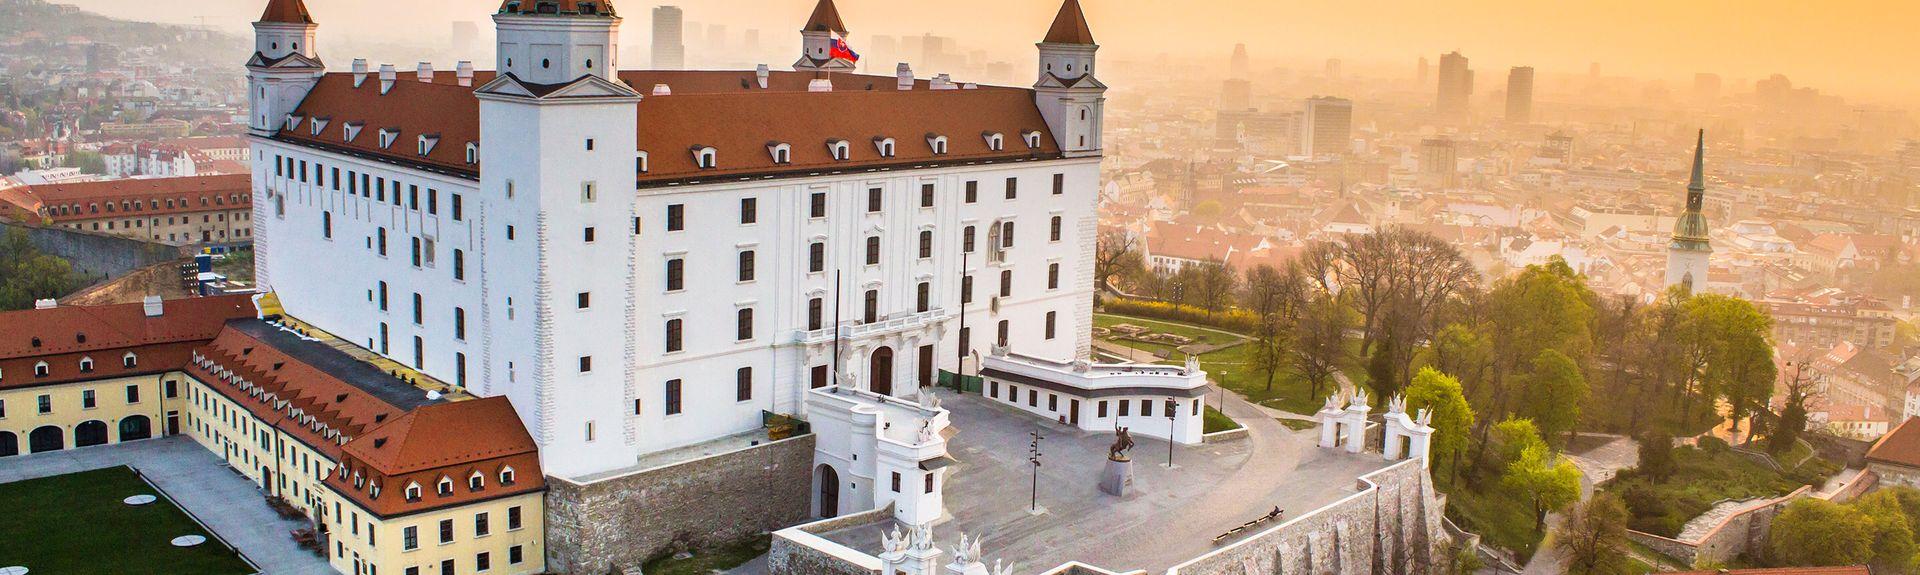 Bratislava, Bratislava, Slovaquie